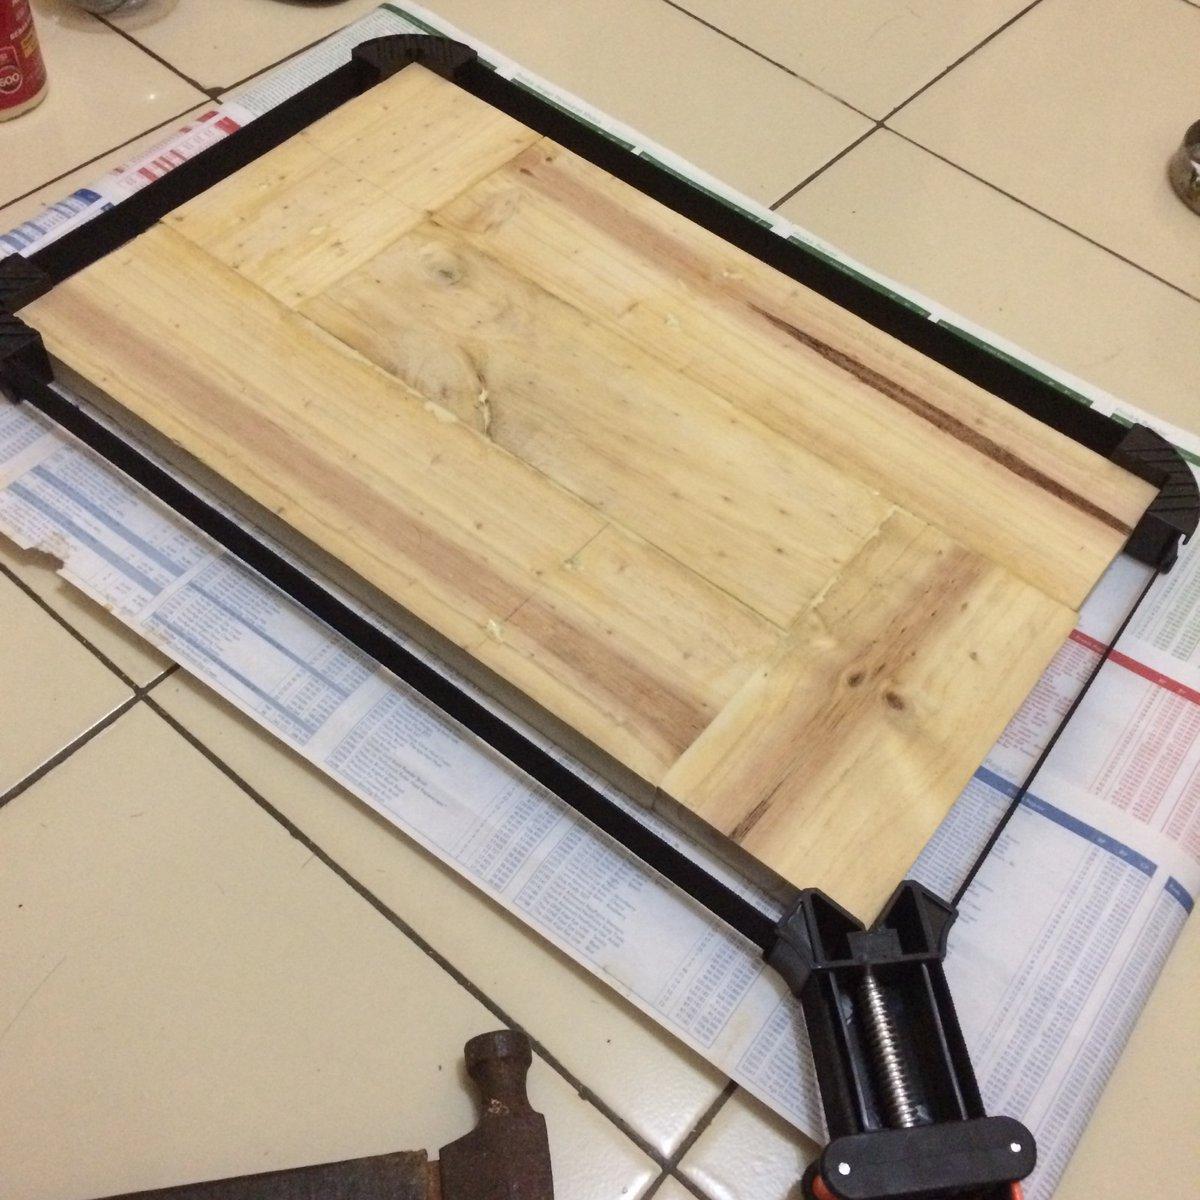 Step by step. Lanjutkan project yg t'tunda.  Sambil bikin project lain. Kerjakan apa yg bisa d kerjakan dg alat yg ada.  Proses menggabungkan kayu. Lumayan menguras energi 😄 learning by doing.  That's all about. https://t.co/lal9iG3VzB